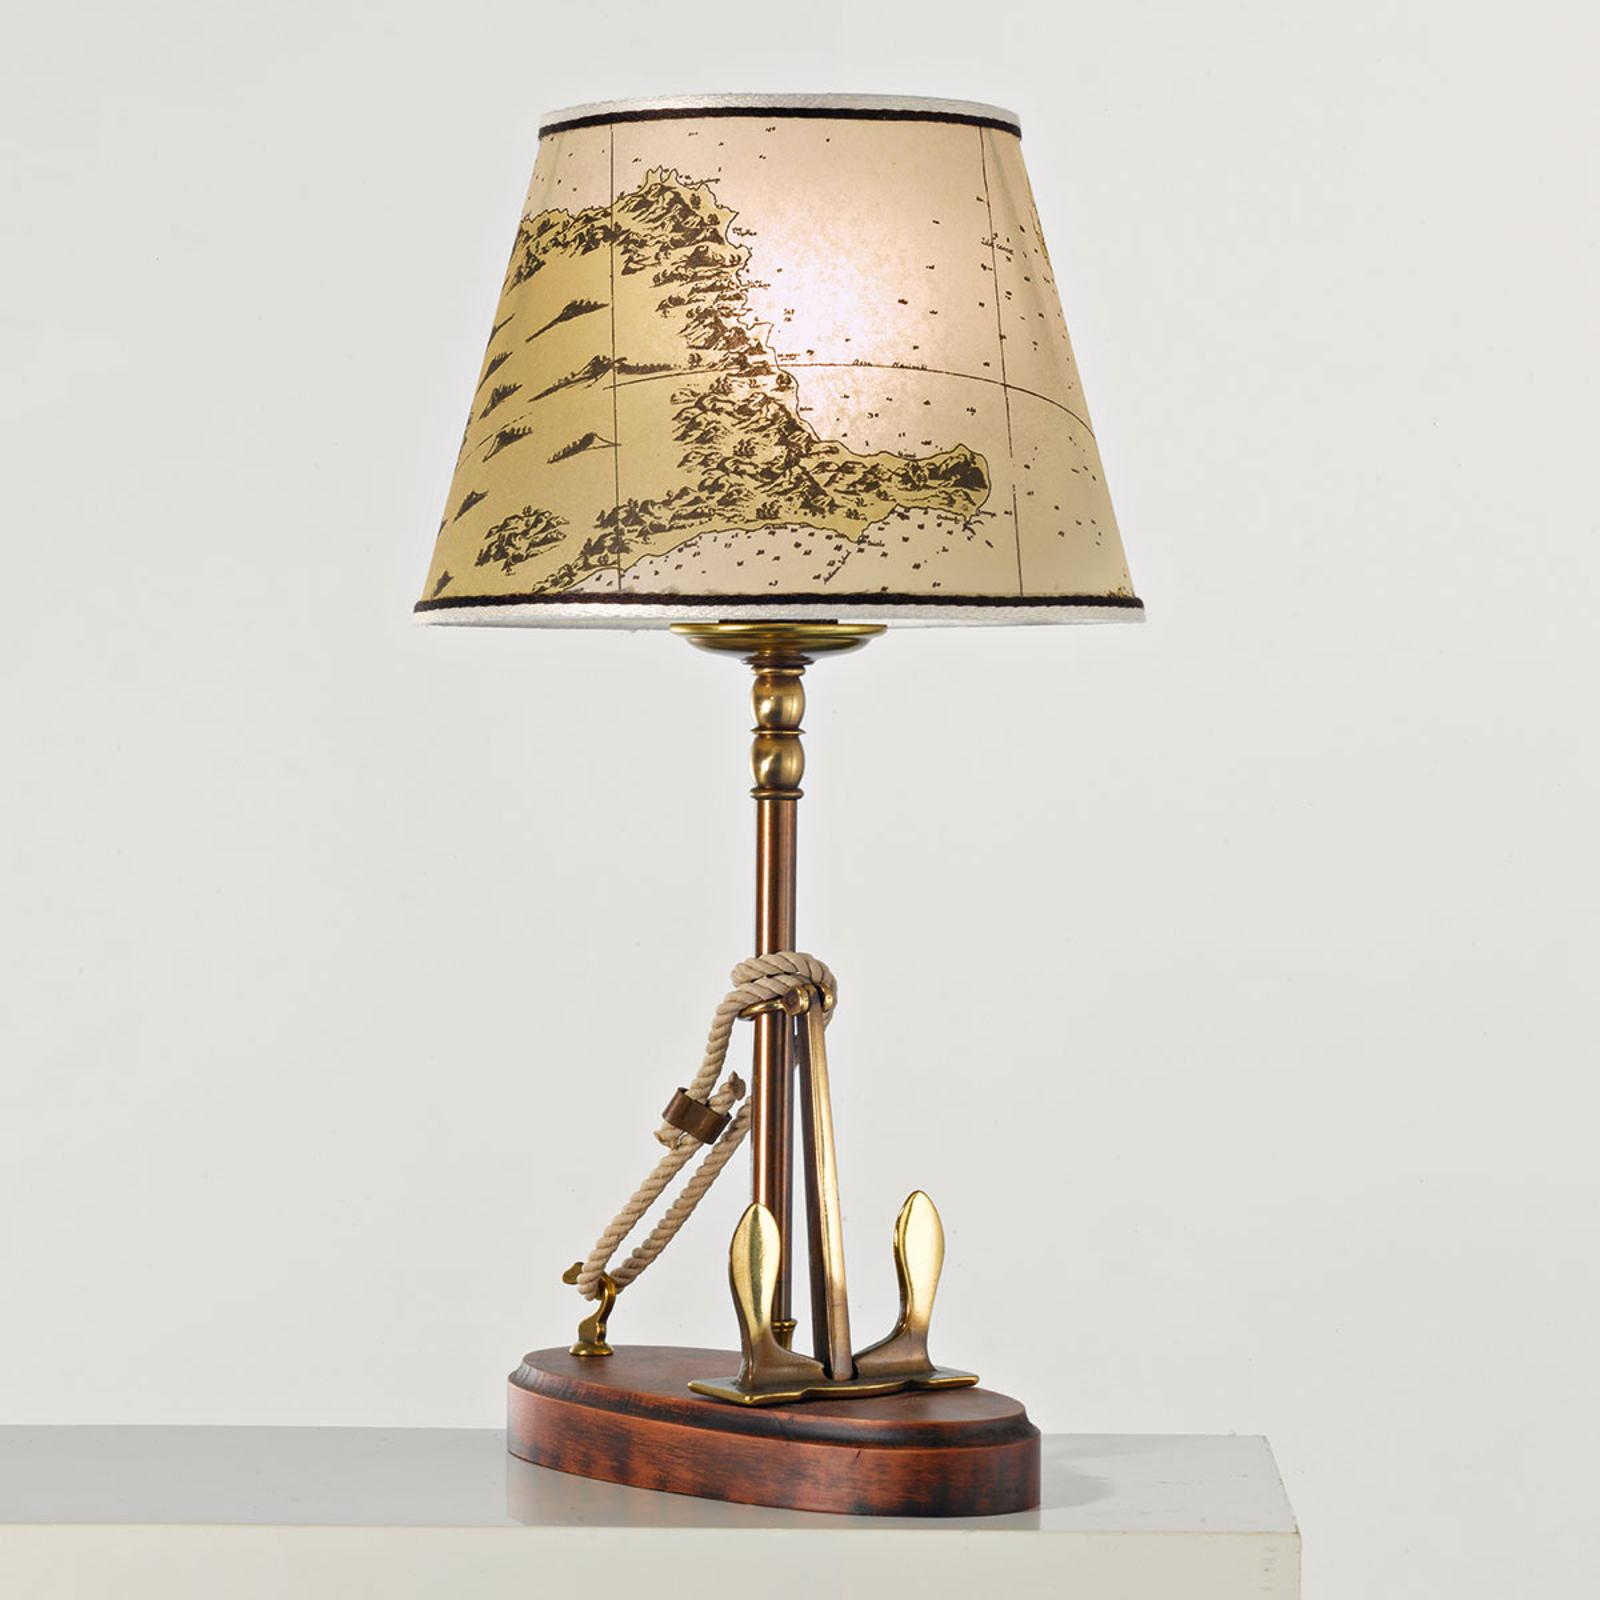 Stylish Nautica table lamp_2008122_1